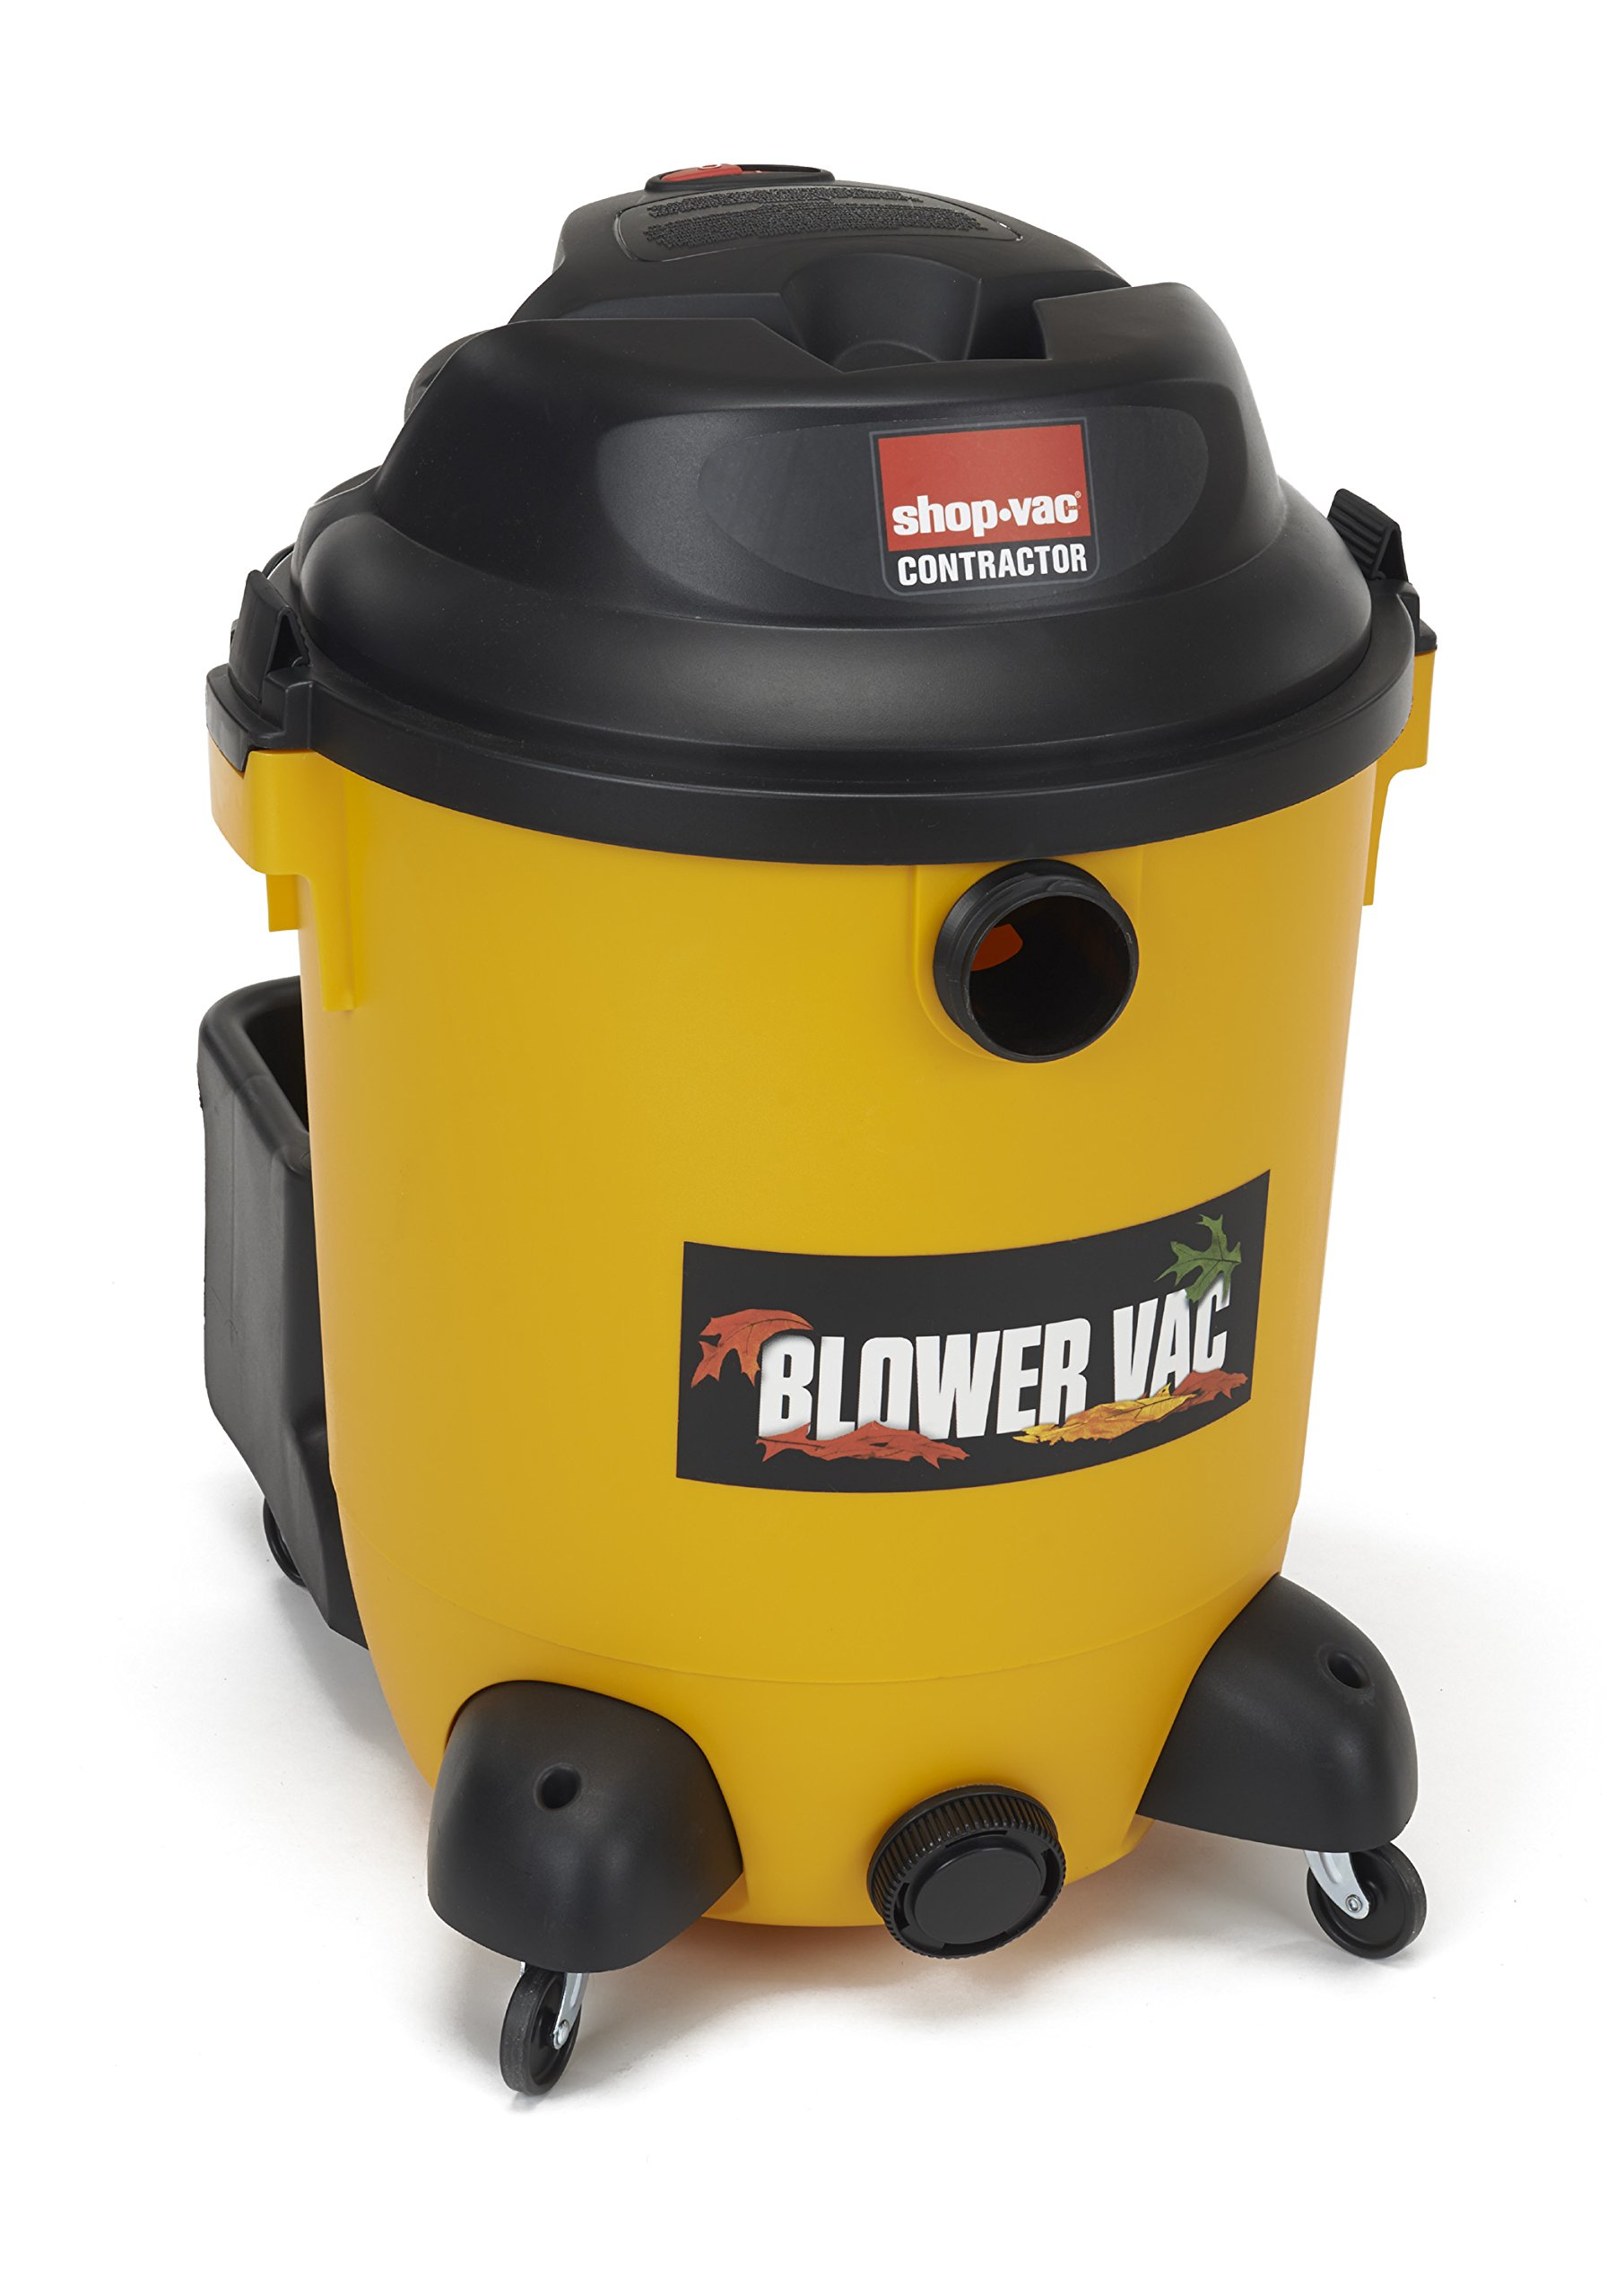 Shop-Vac 9631410 6.5 Peak HP Wet Dry Vacuum with Detachable Blower, 14-Gallon